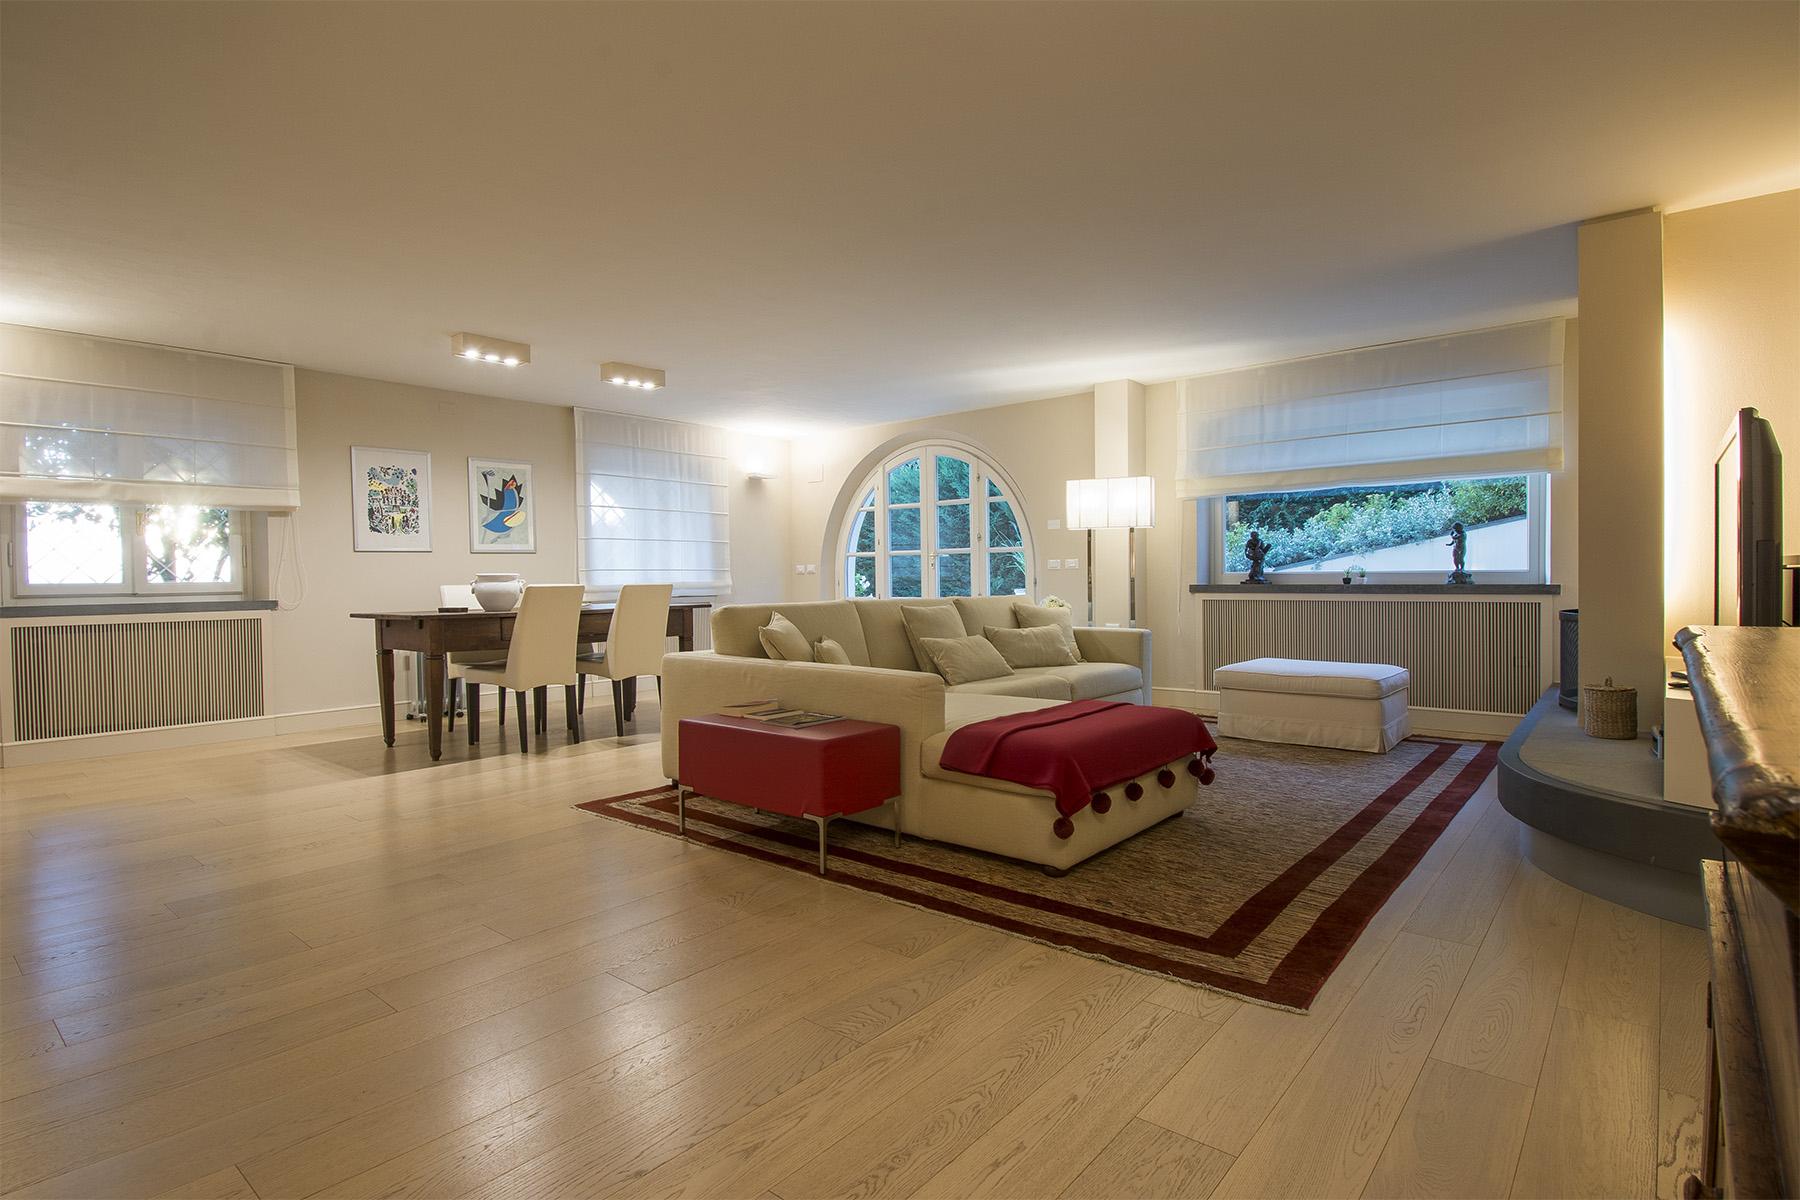 Villa in Vendita a Lucca: 5 locali, 470 mq - Foto 8